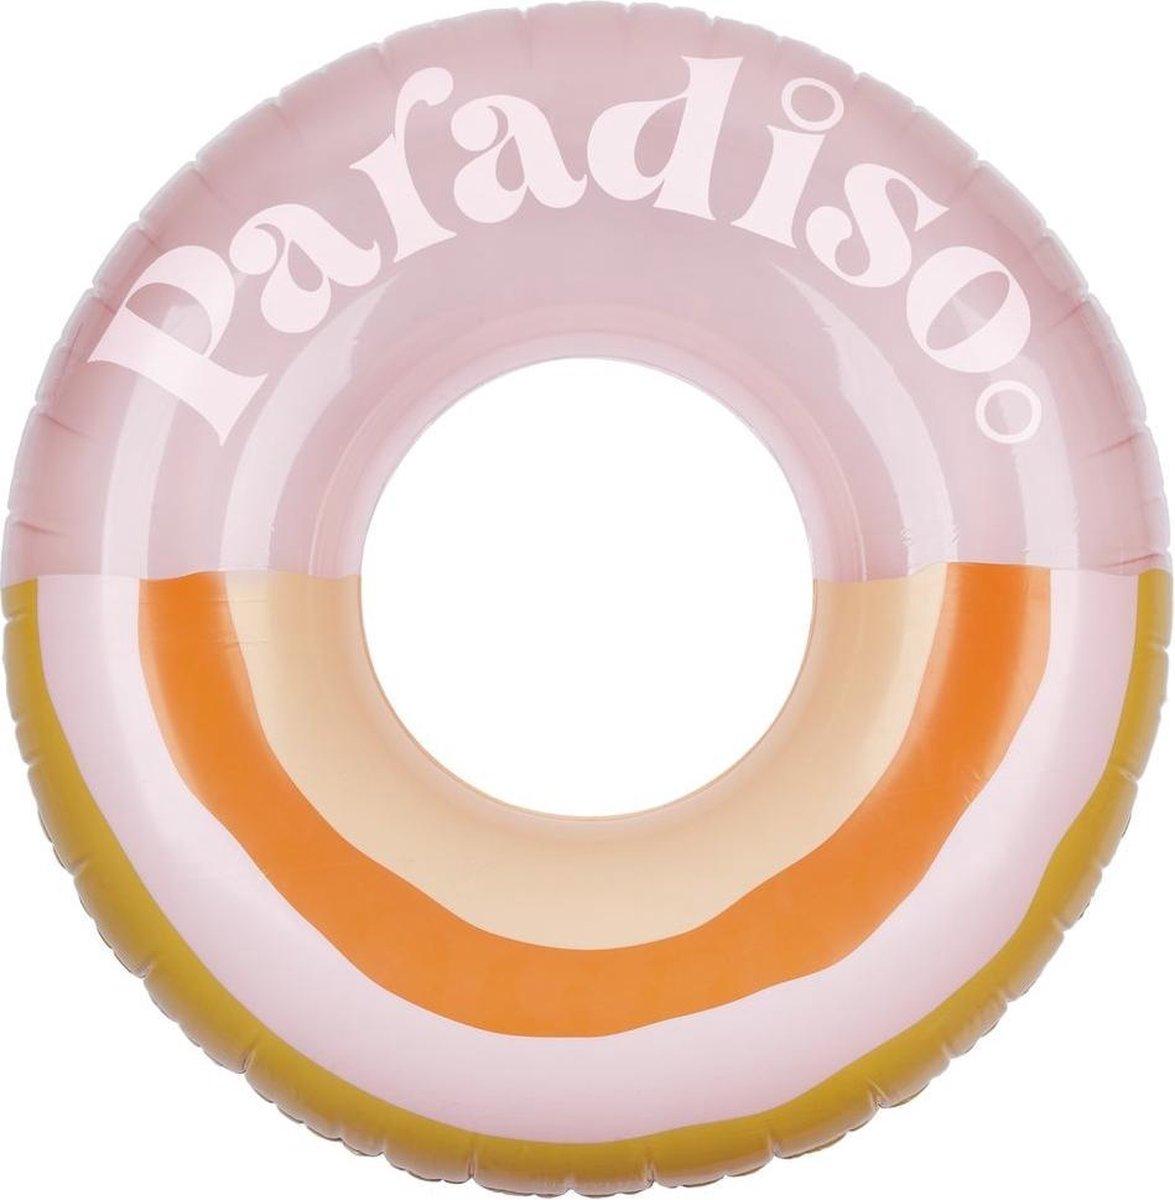 Sunnylife Opblaasbare Zwemband Paradiso